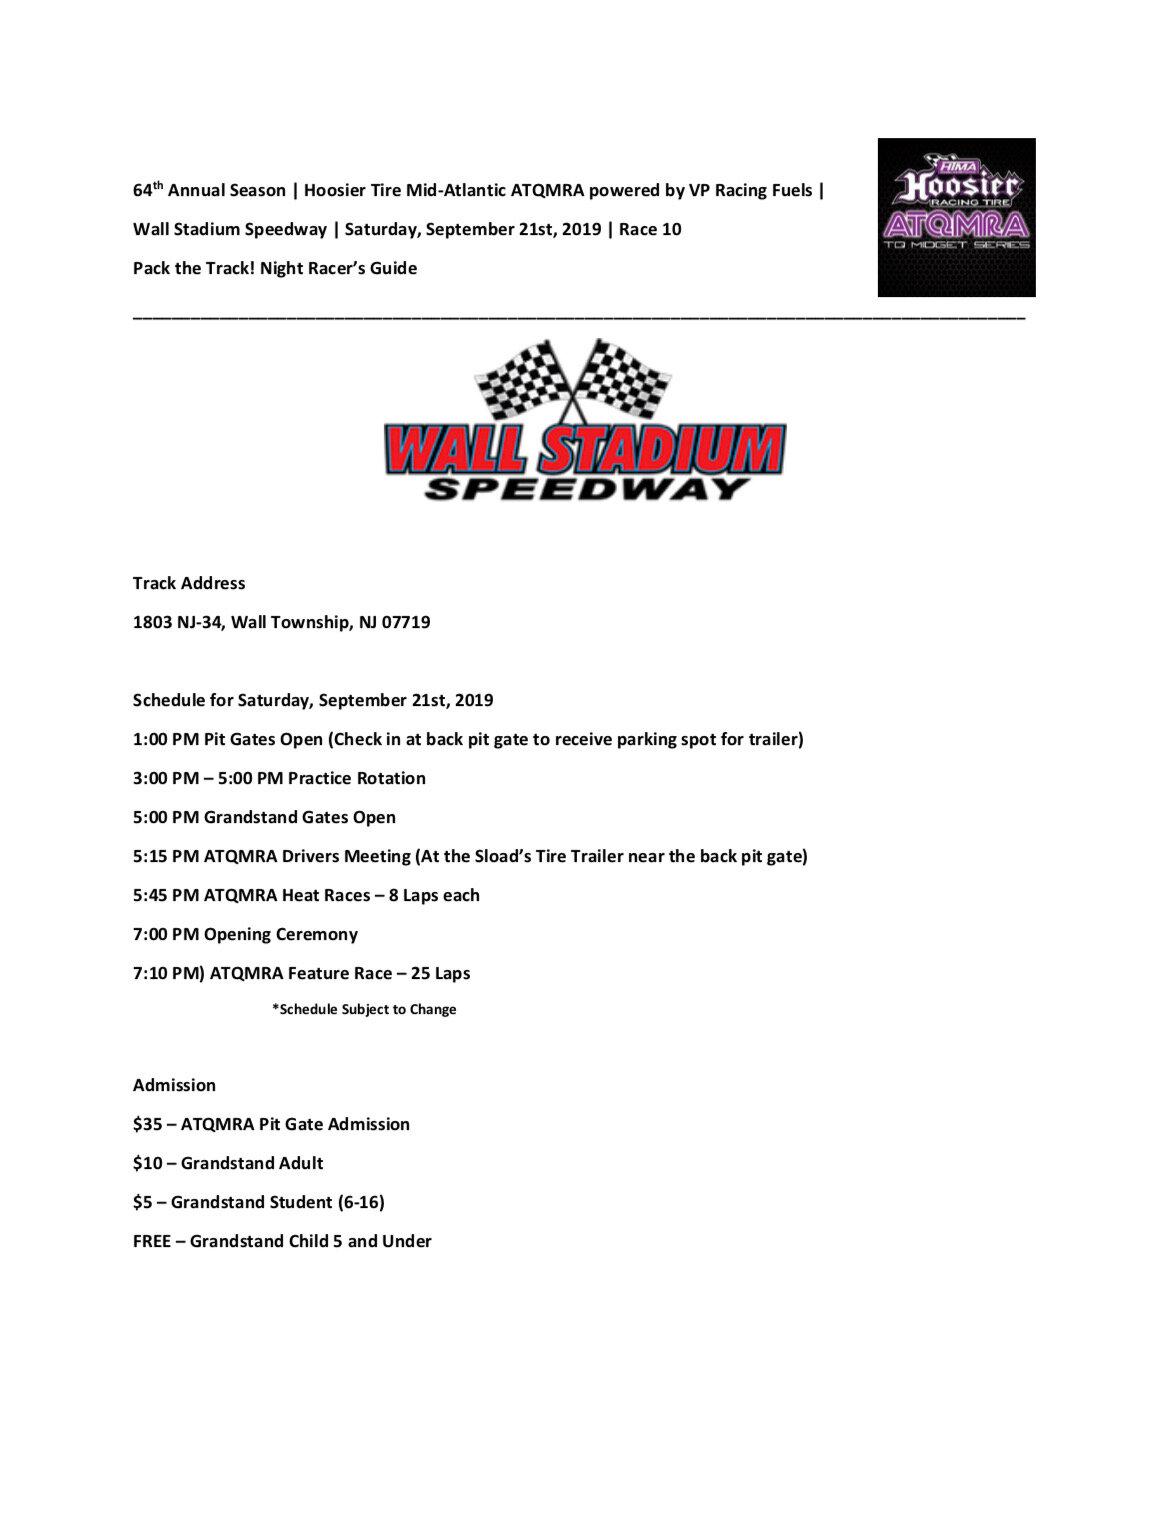 Wall Stadium Speedway 9-21-19.jpeg